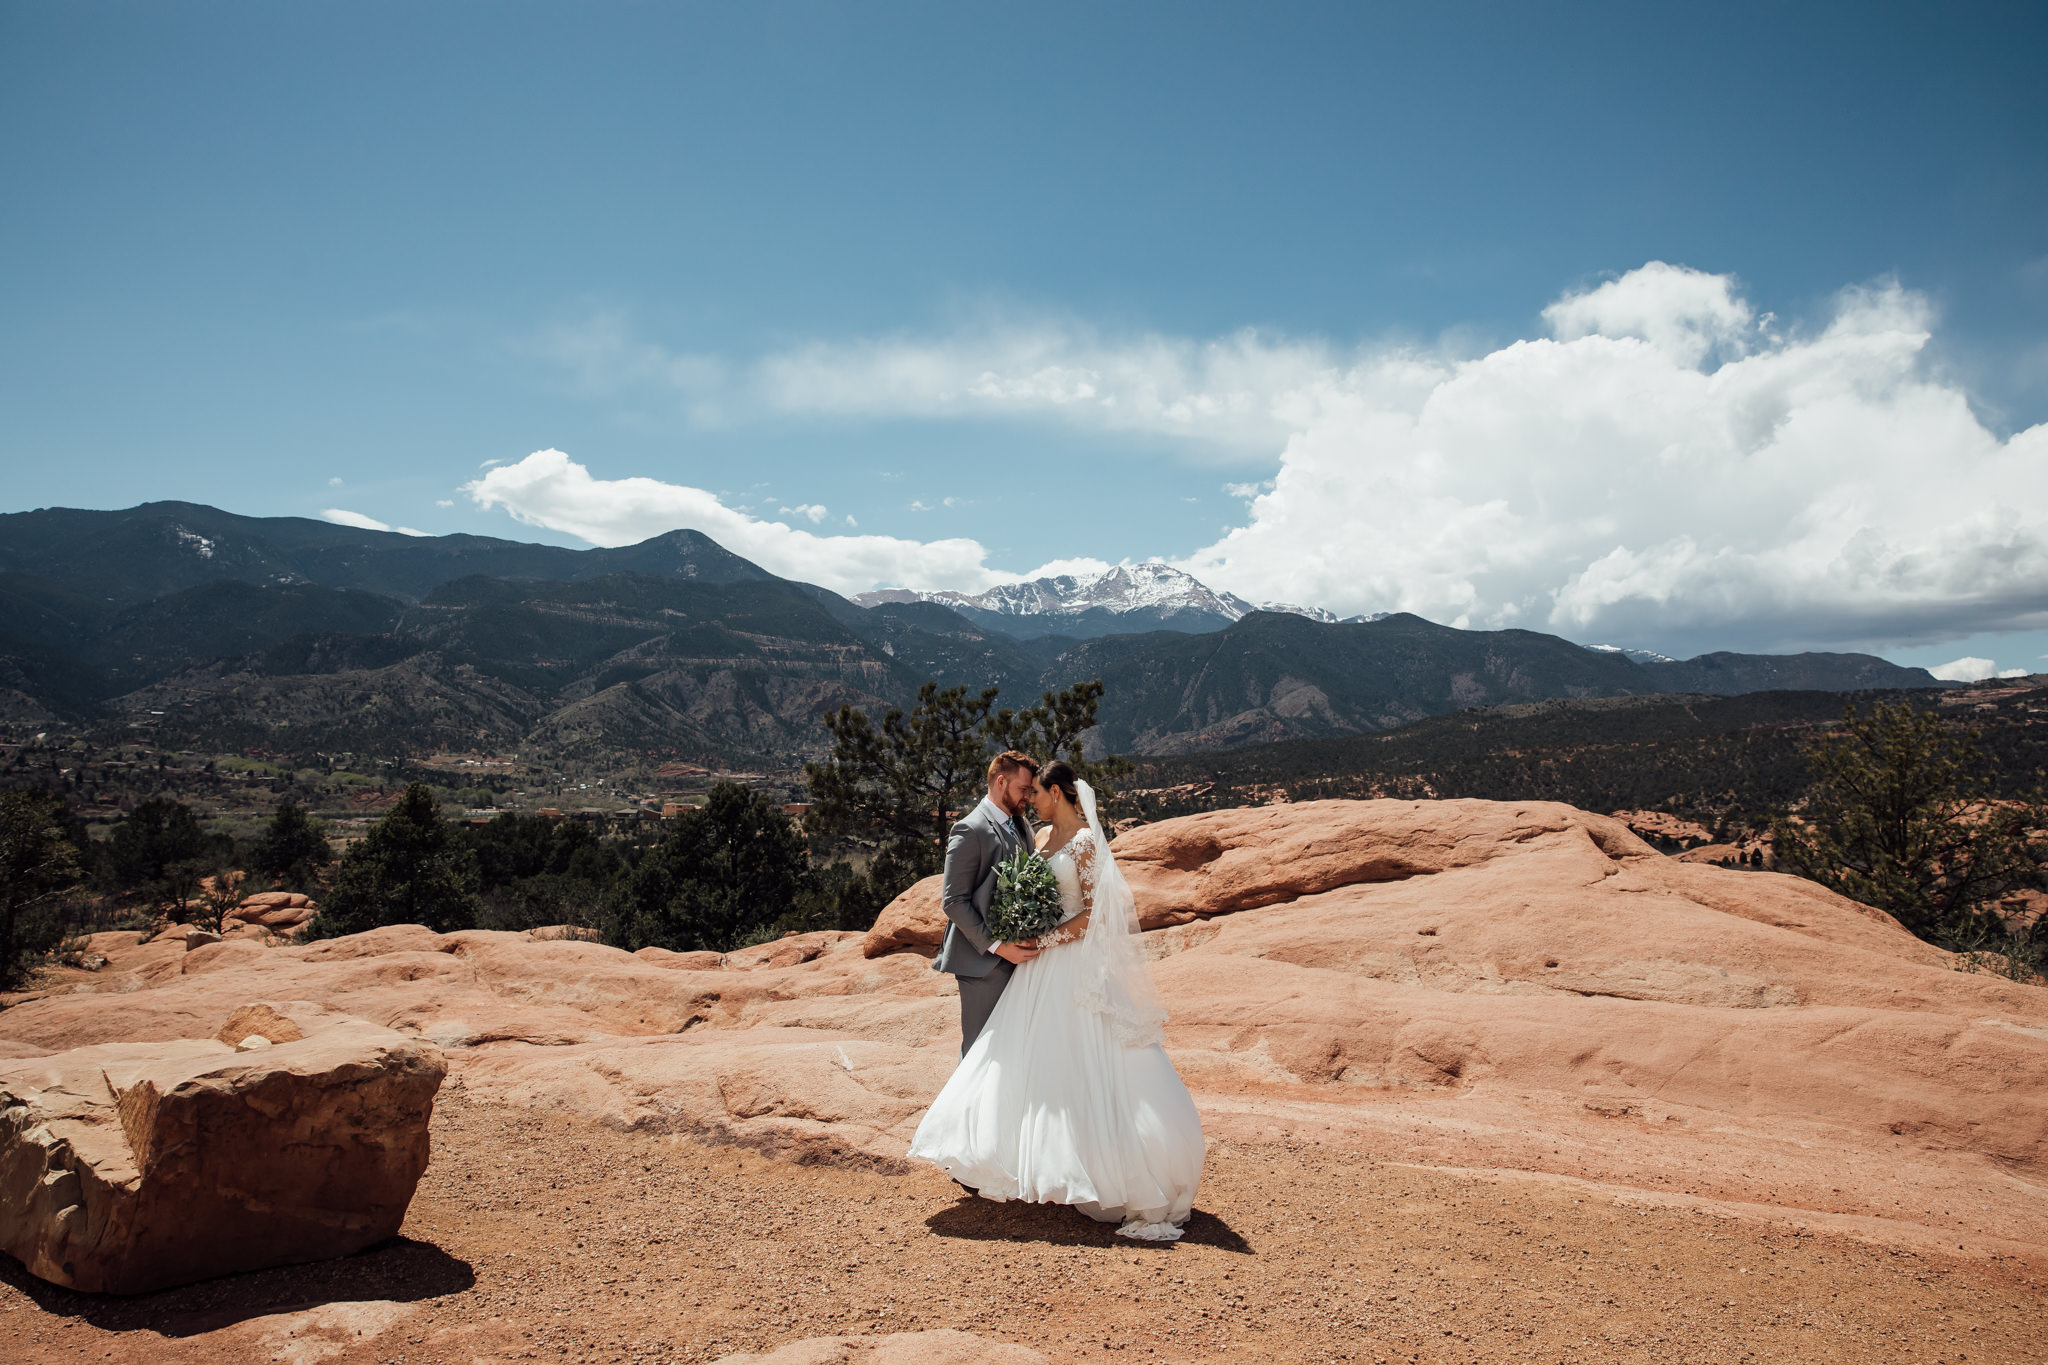 phantom-canyon-brewery-colorado-springs-wedding-photographer-88.jpg